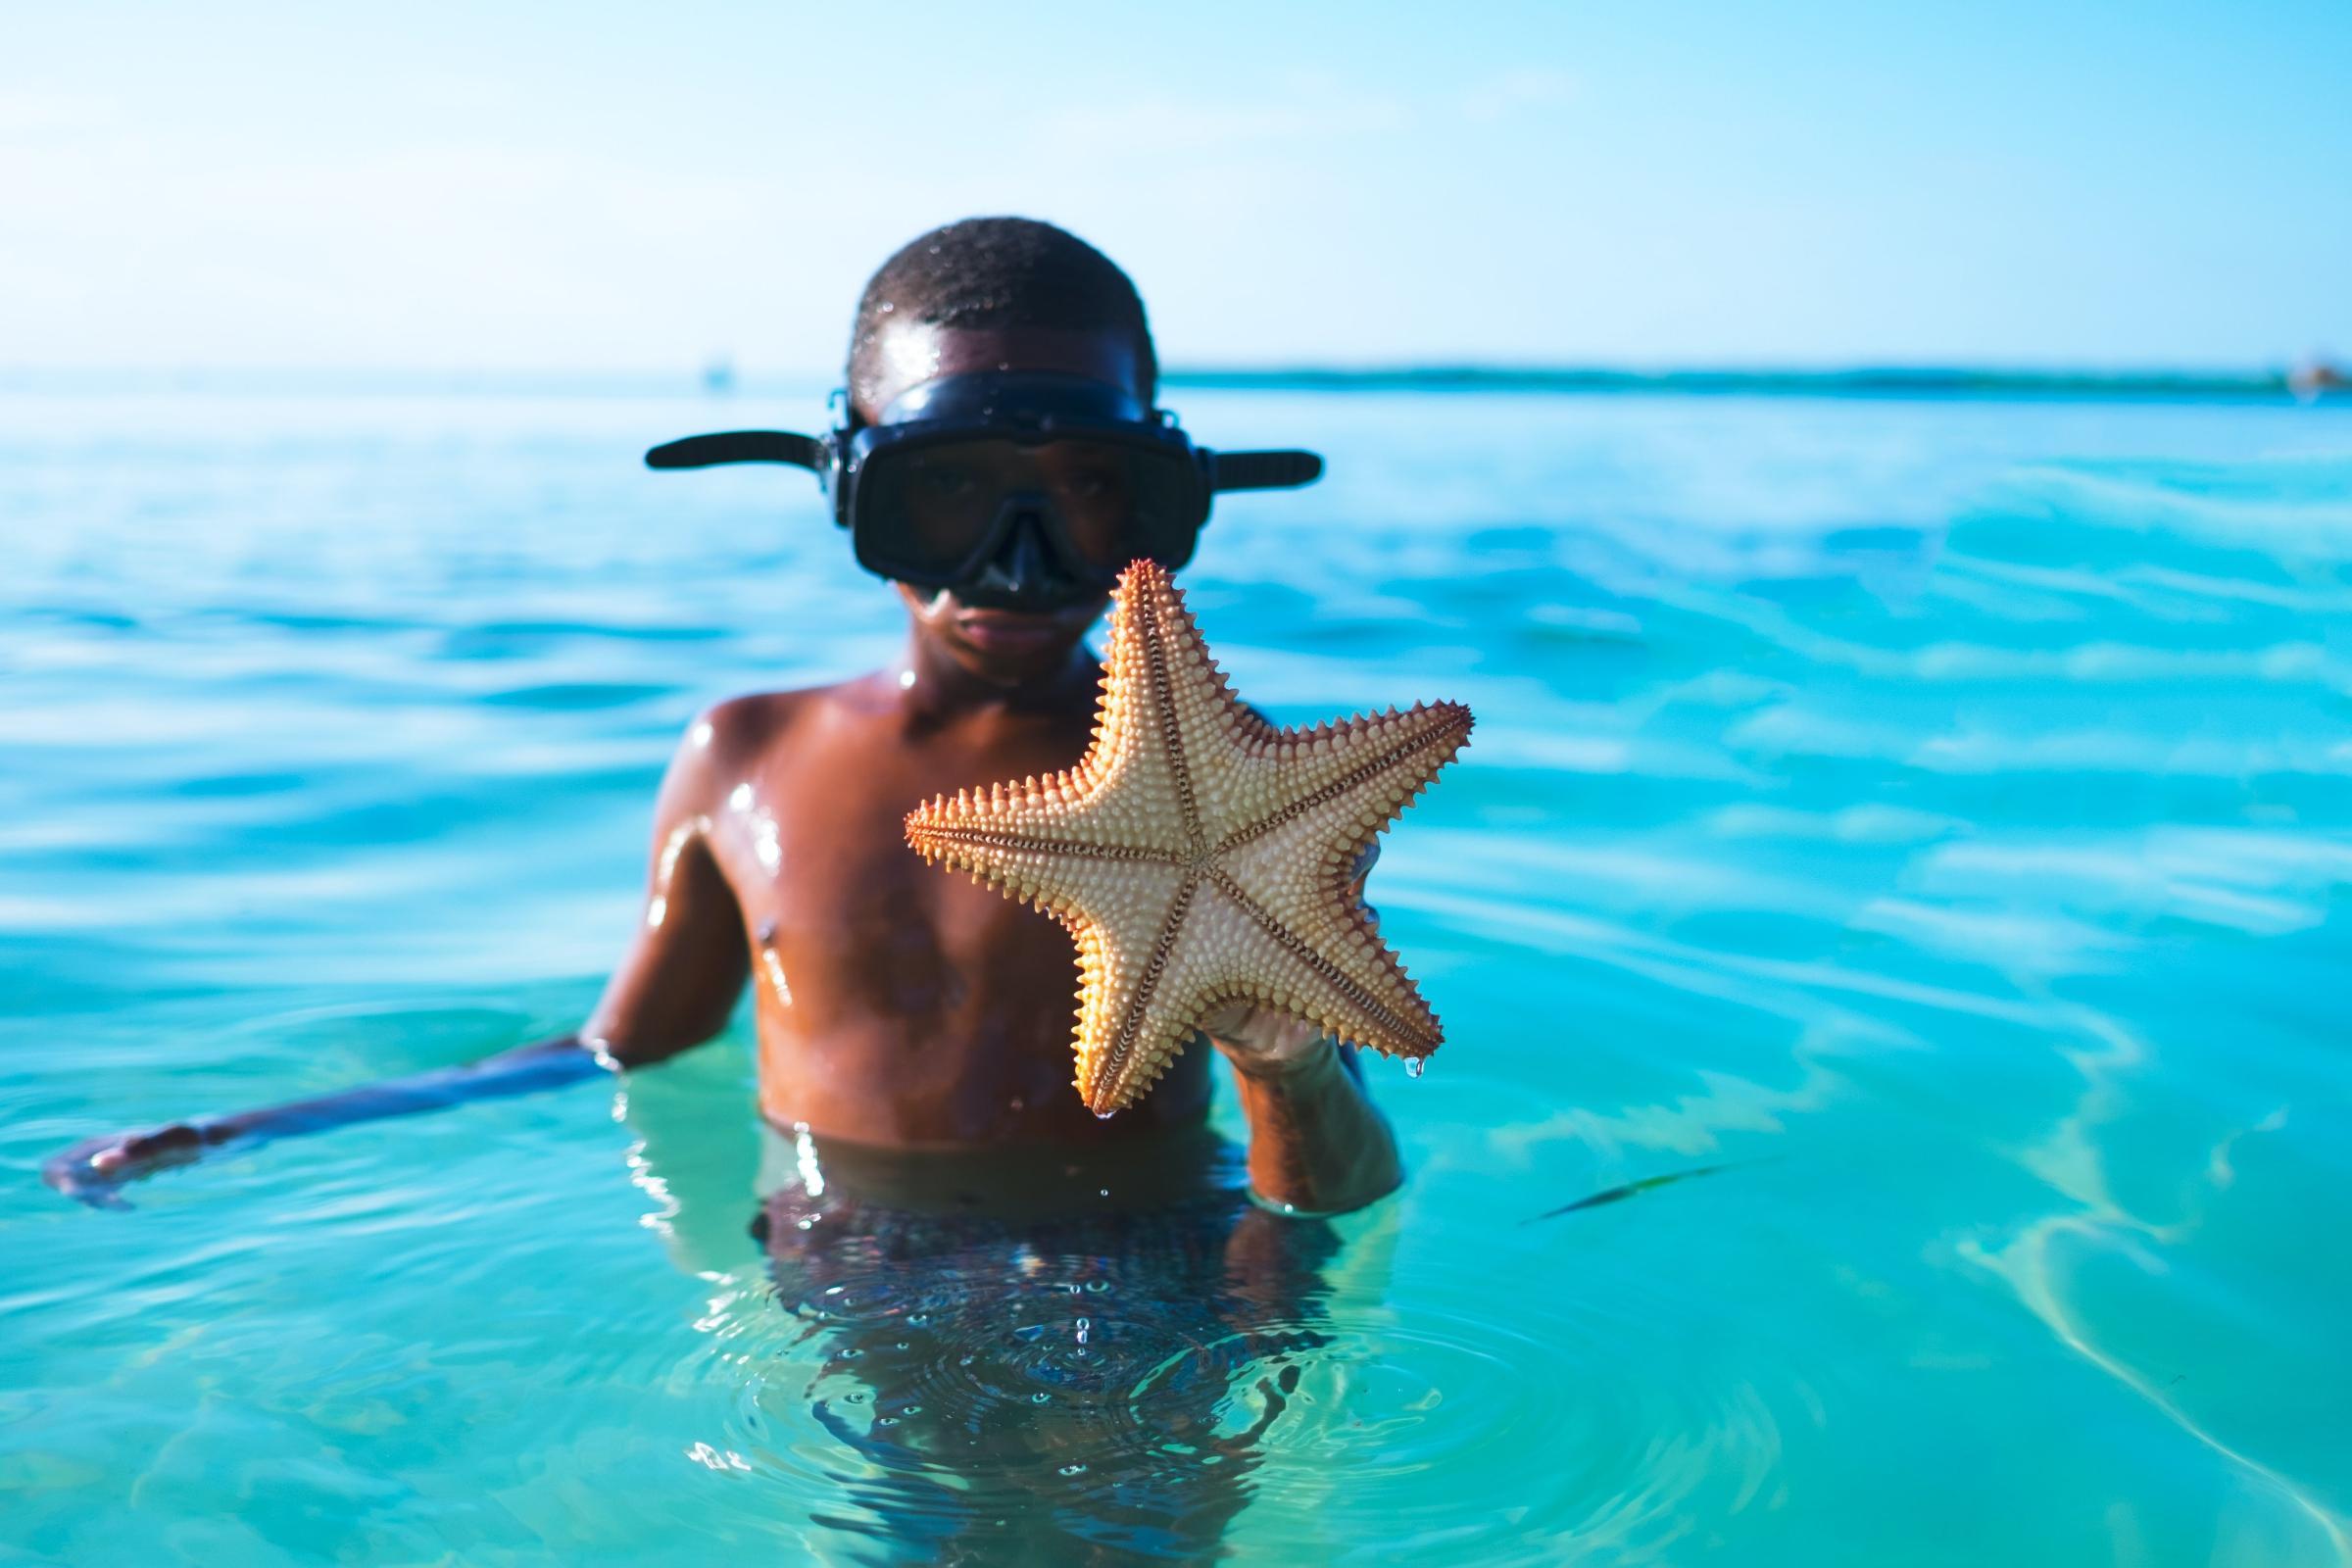 Little boy holding starfish - image by Claude Piché on Unsplash